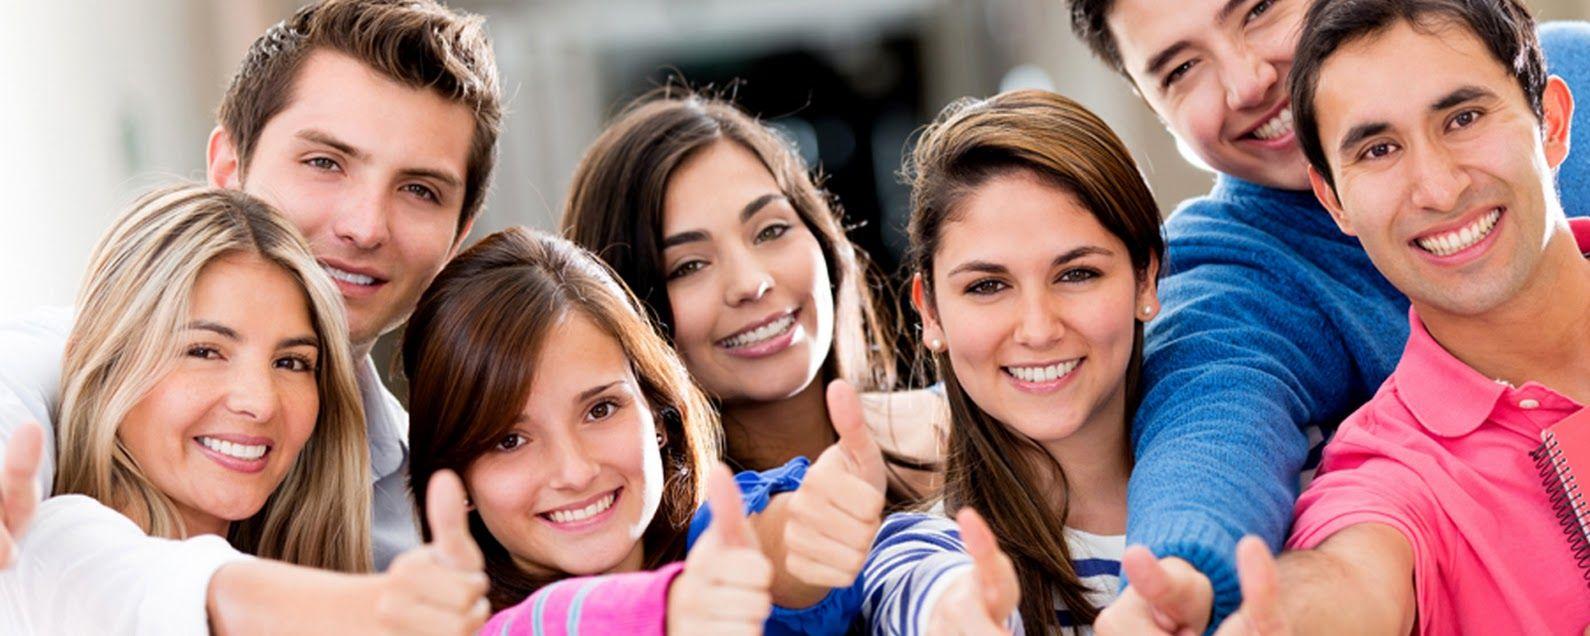 Shiksha4u Overseas Education Consultants (With images